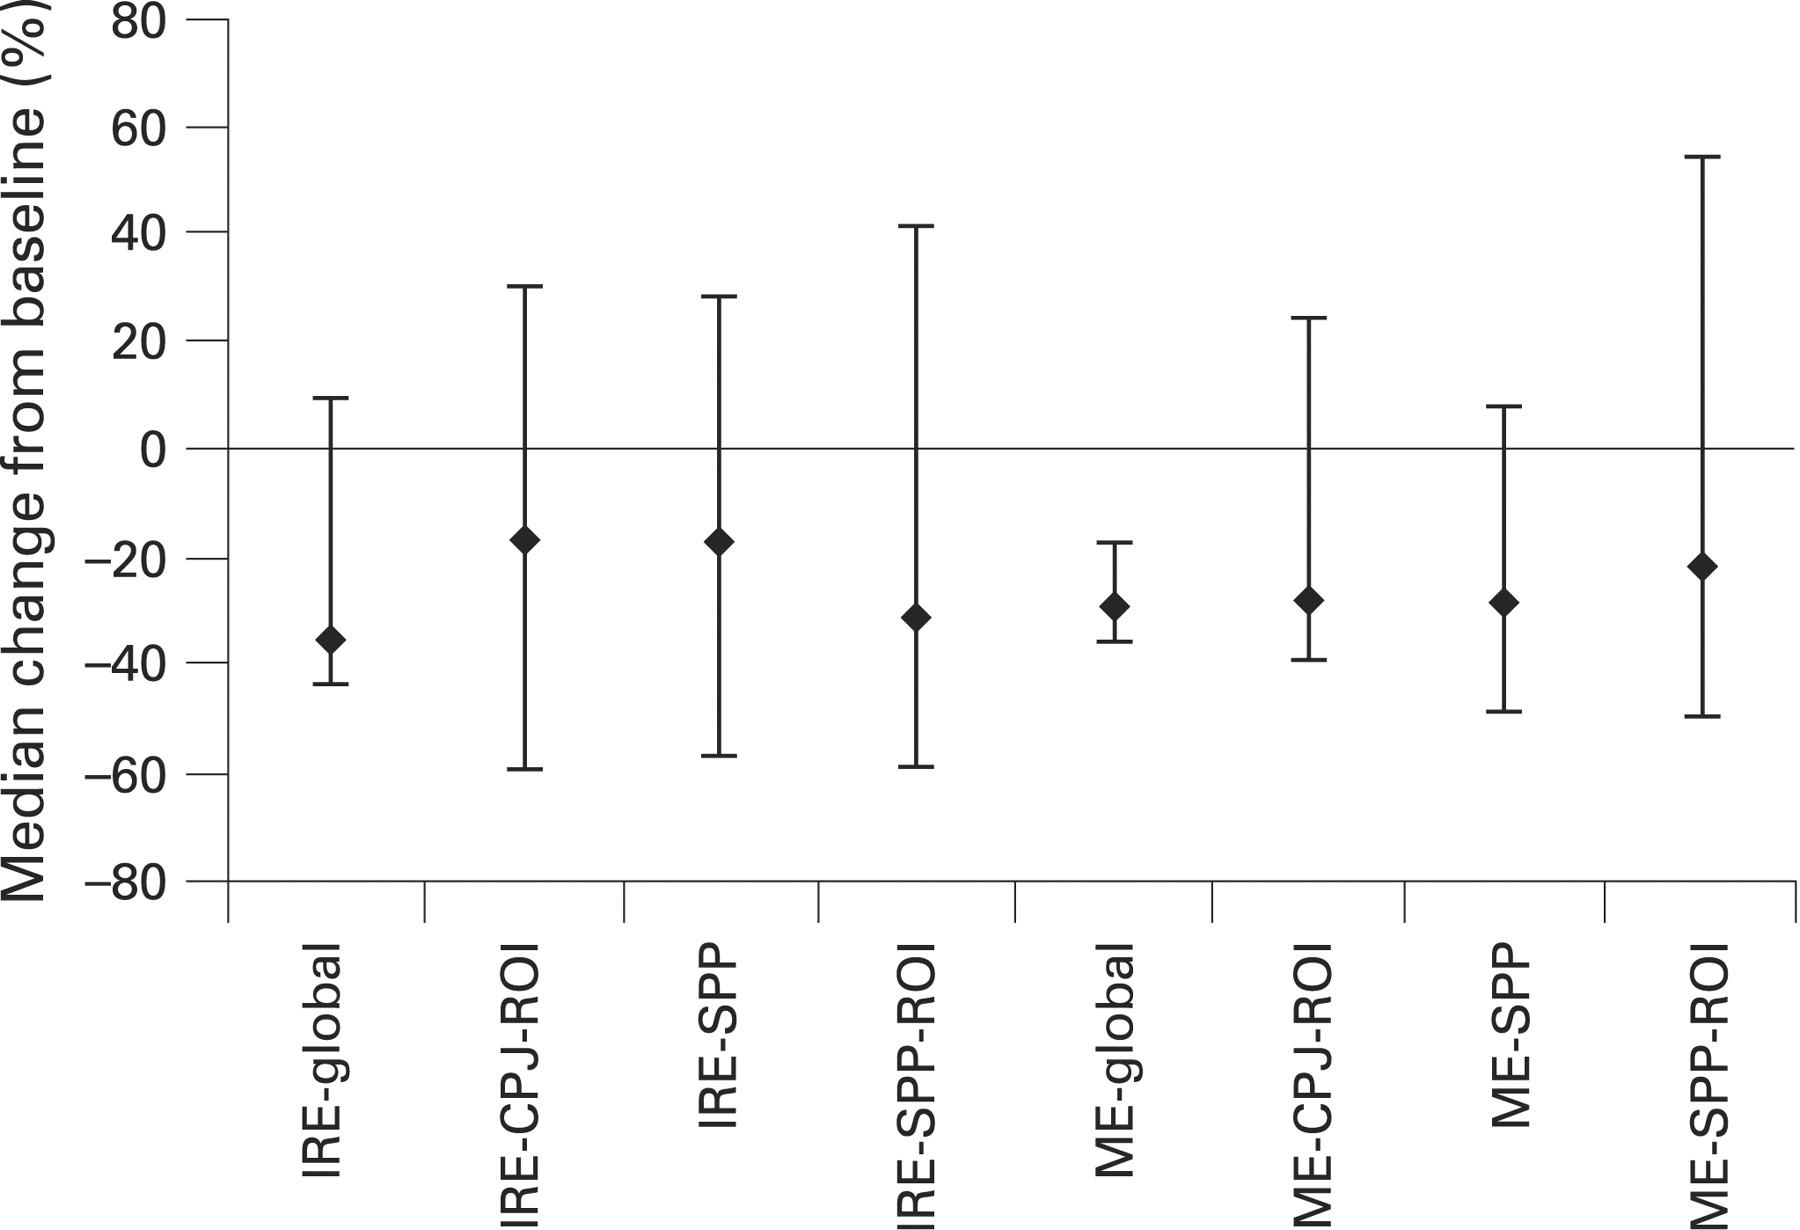 JCI Insight - B lymphocyte alterations accompany abatacept ...